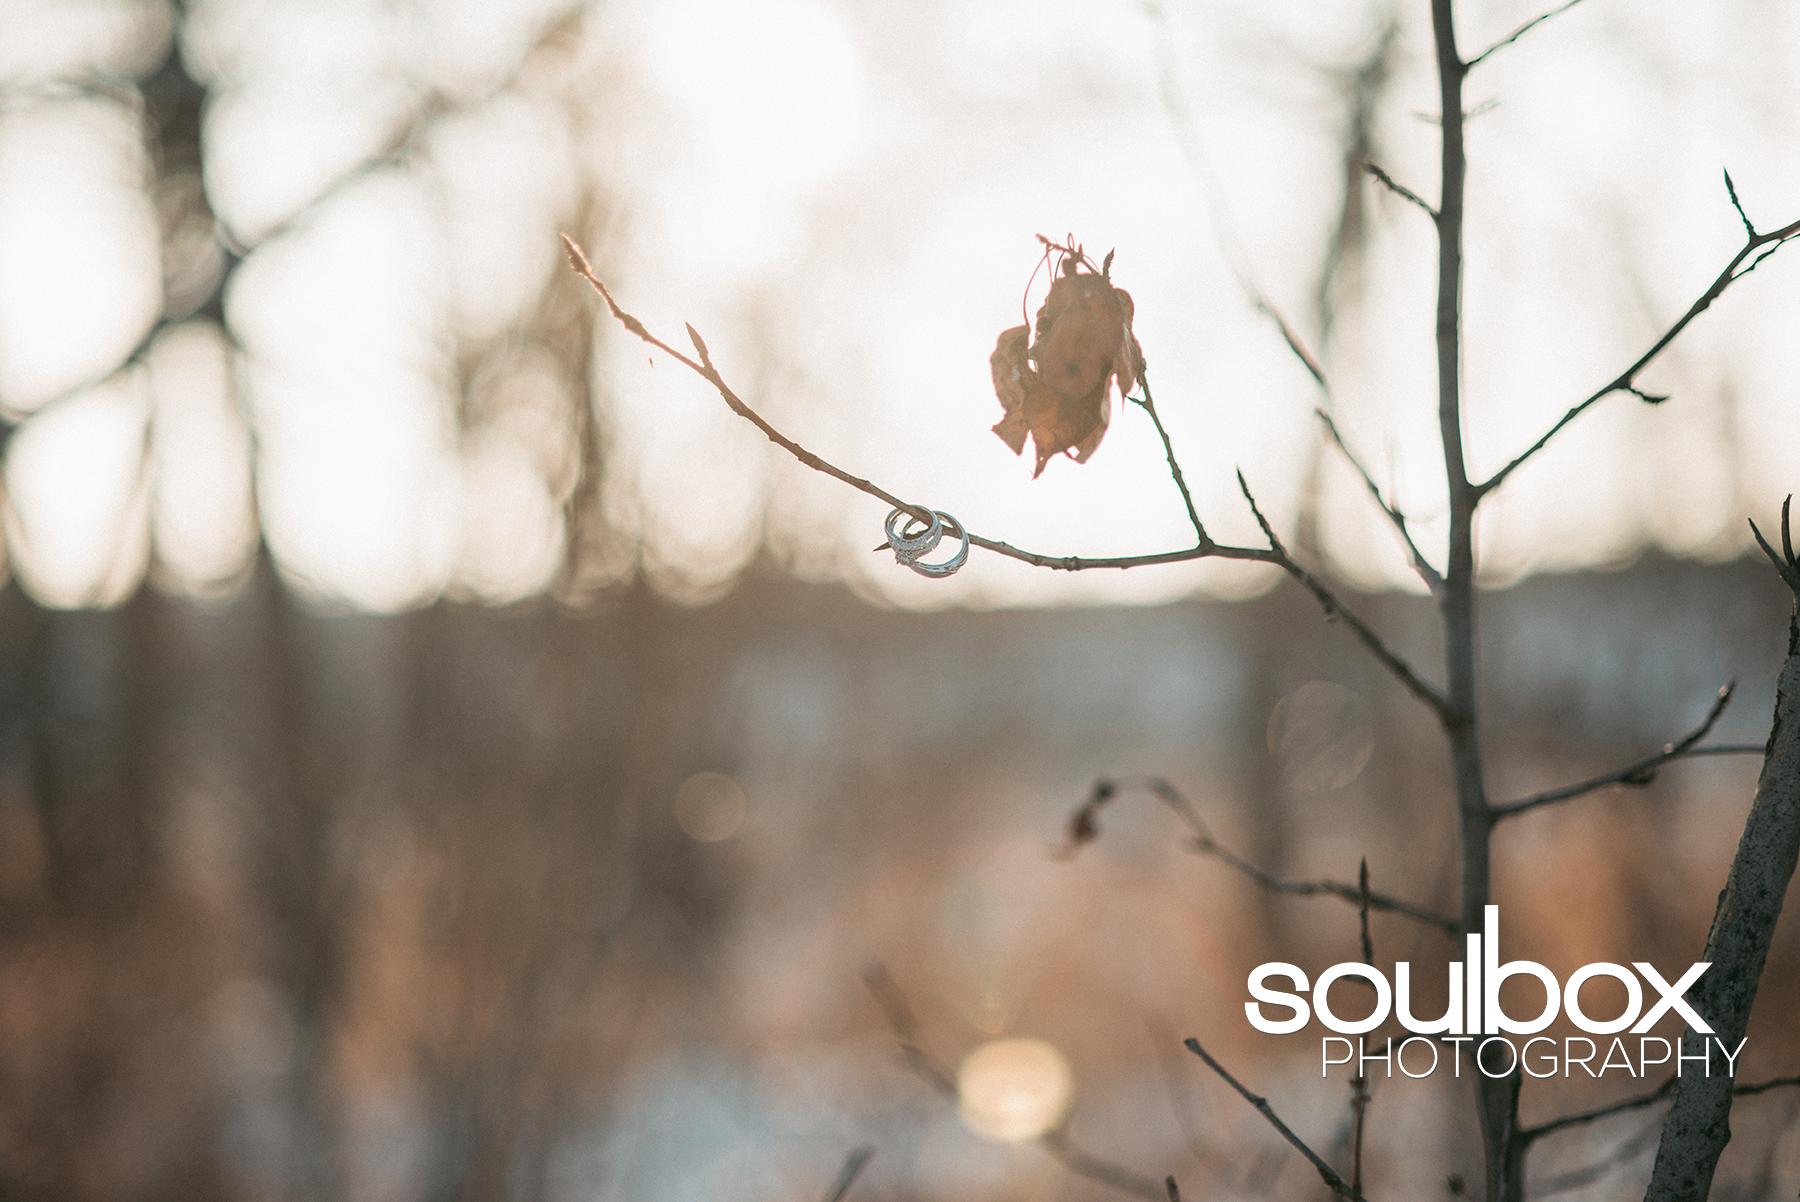 SoulboxPhotography-WinterWedding-7.jpg